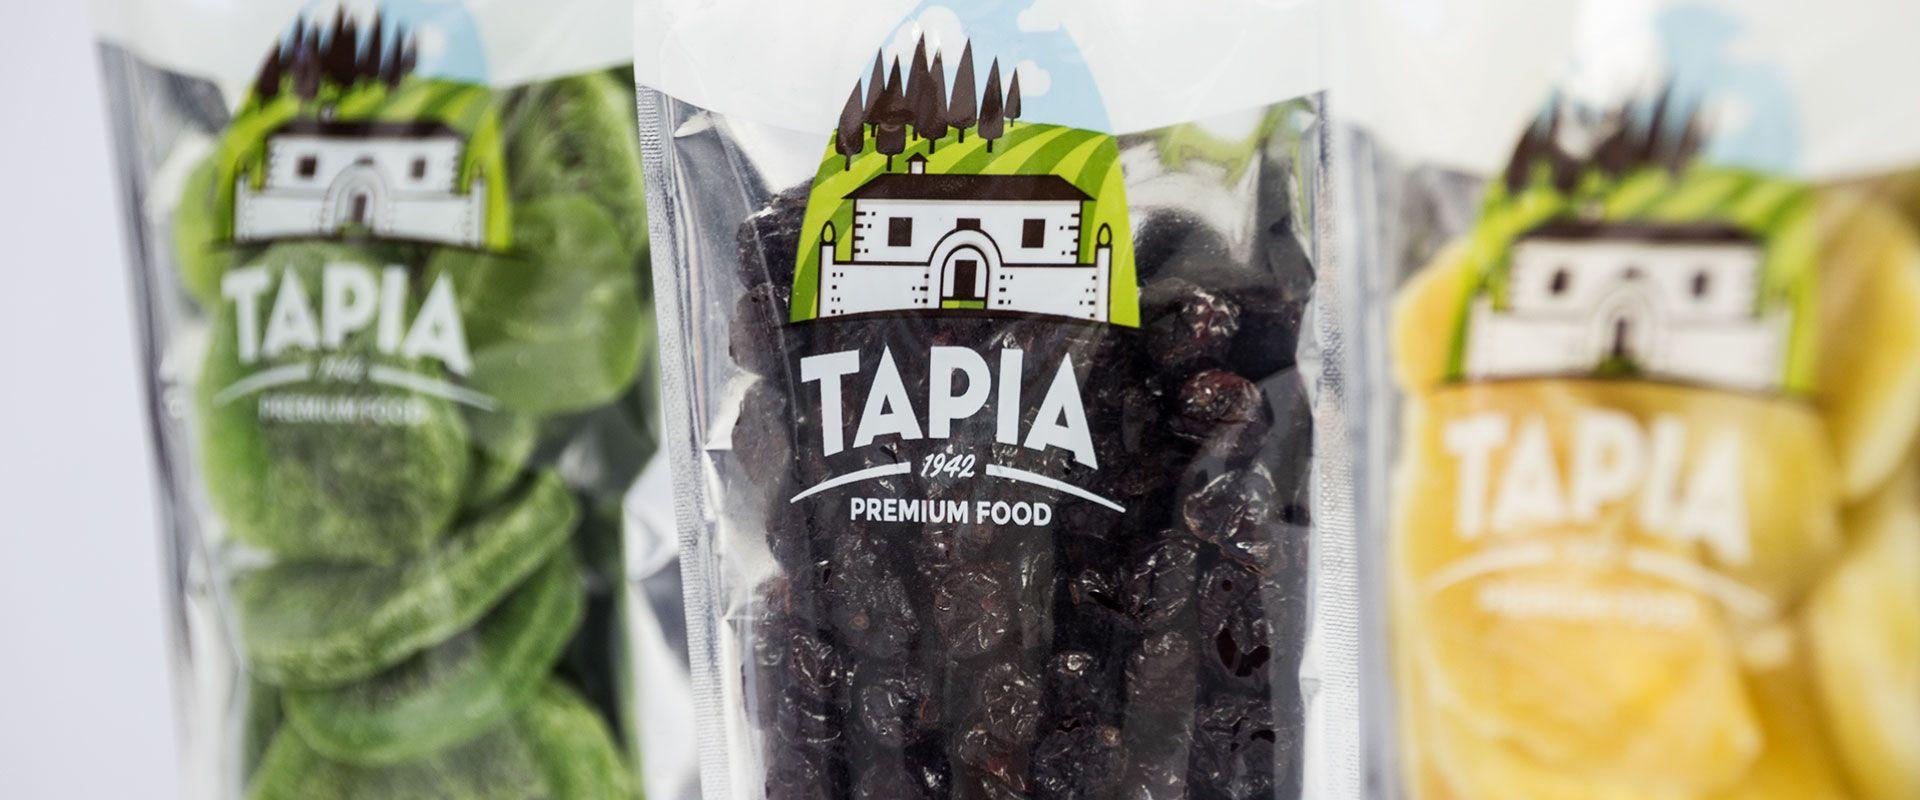 Imagen Tapia img-total